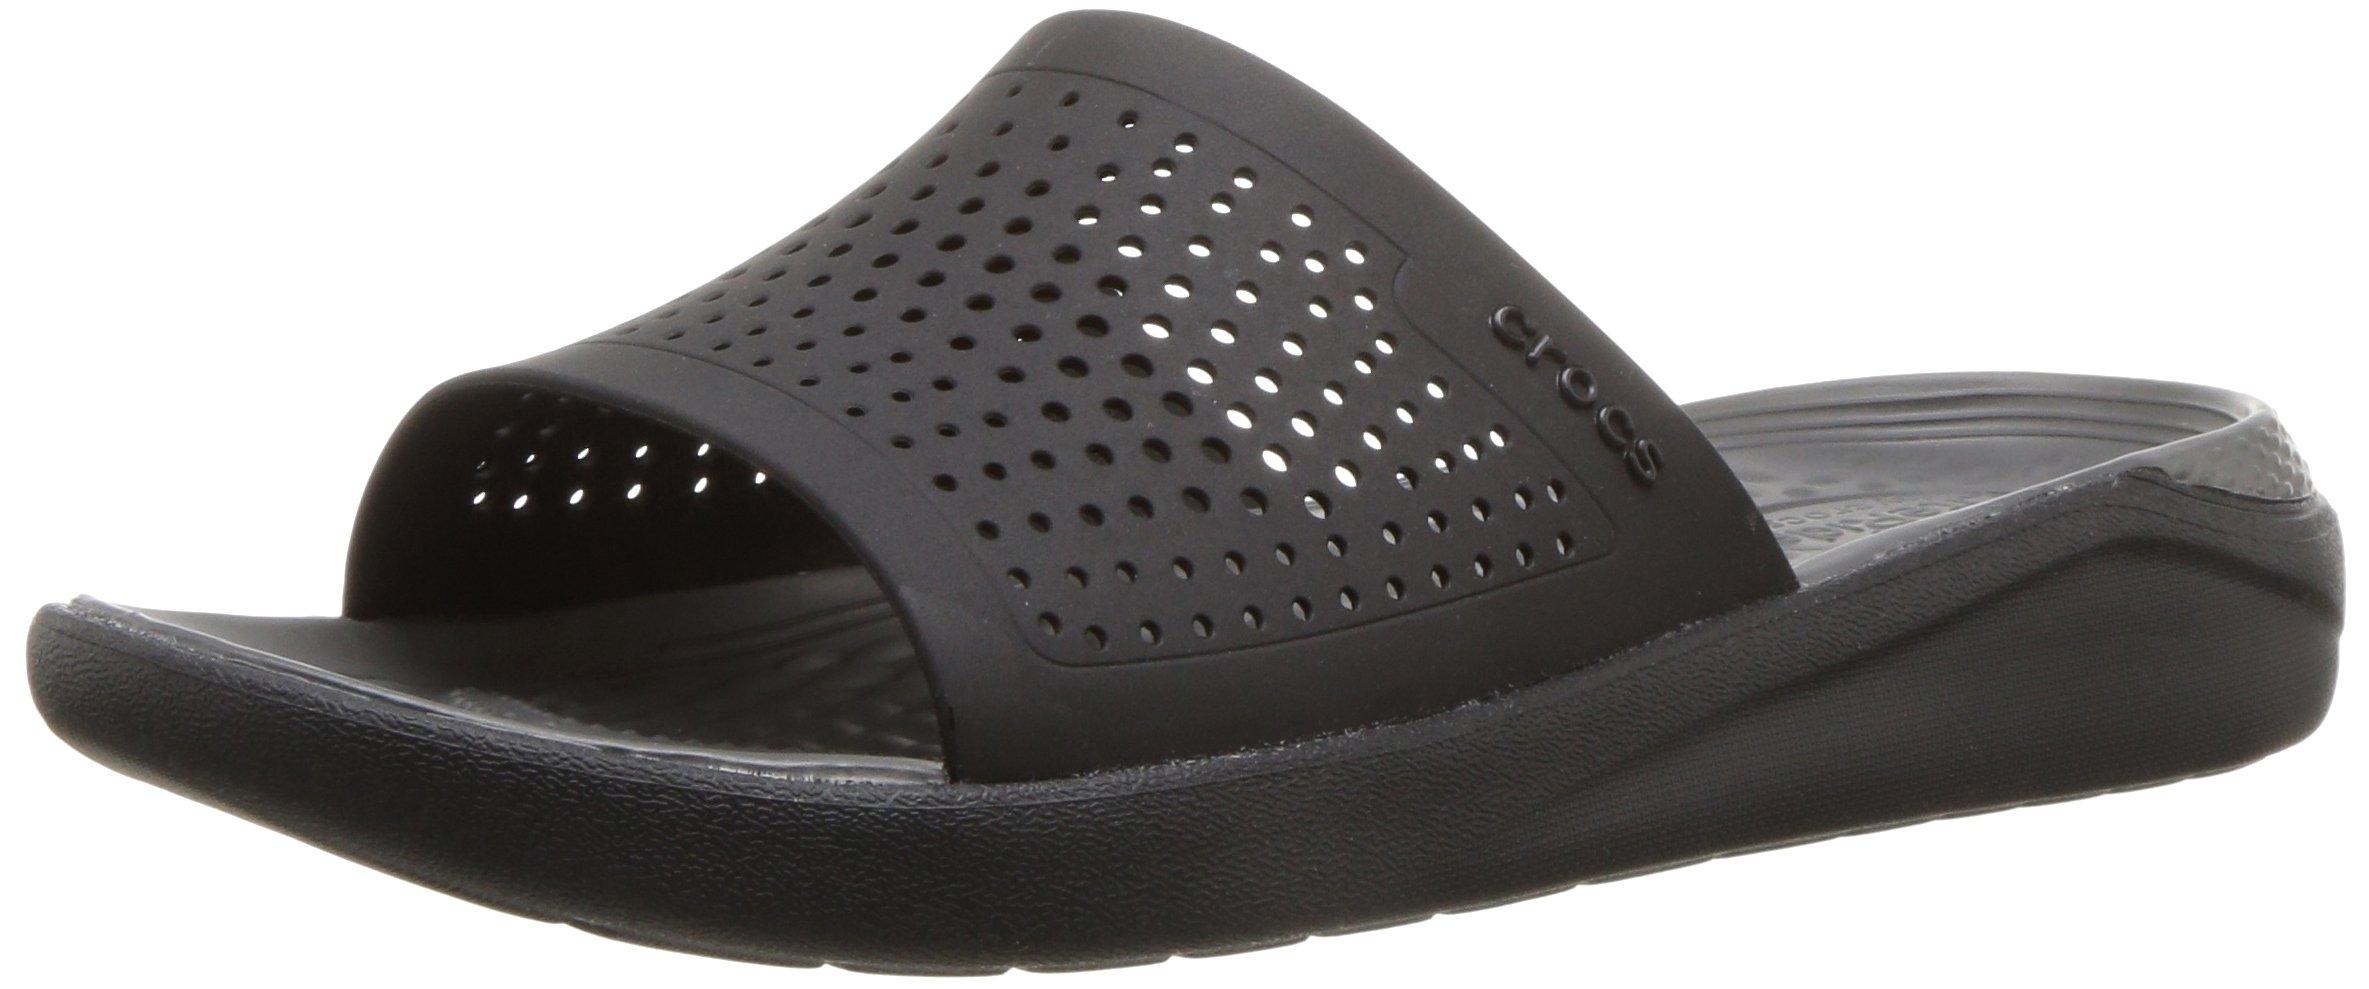 Crocs LiteRide Slide Sandal, Black/Slate Grey, 10 US Women / 8 US Men by Crocs